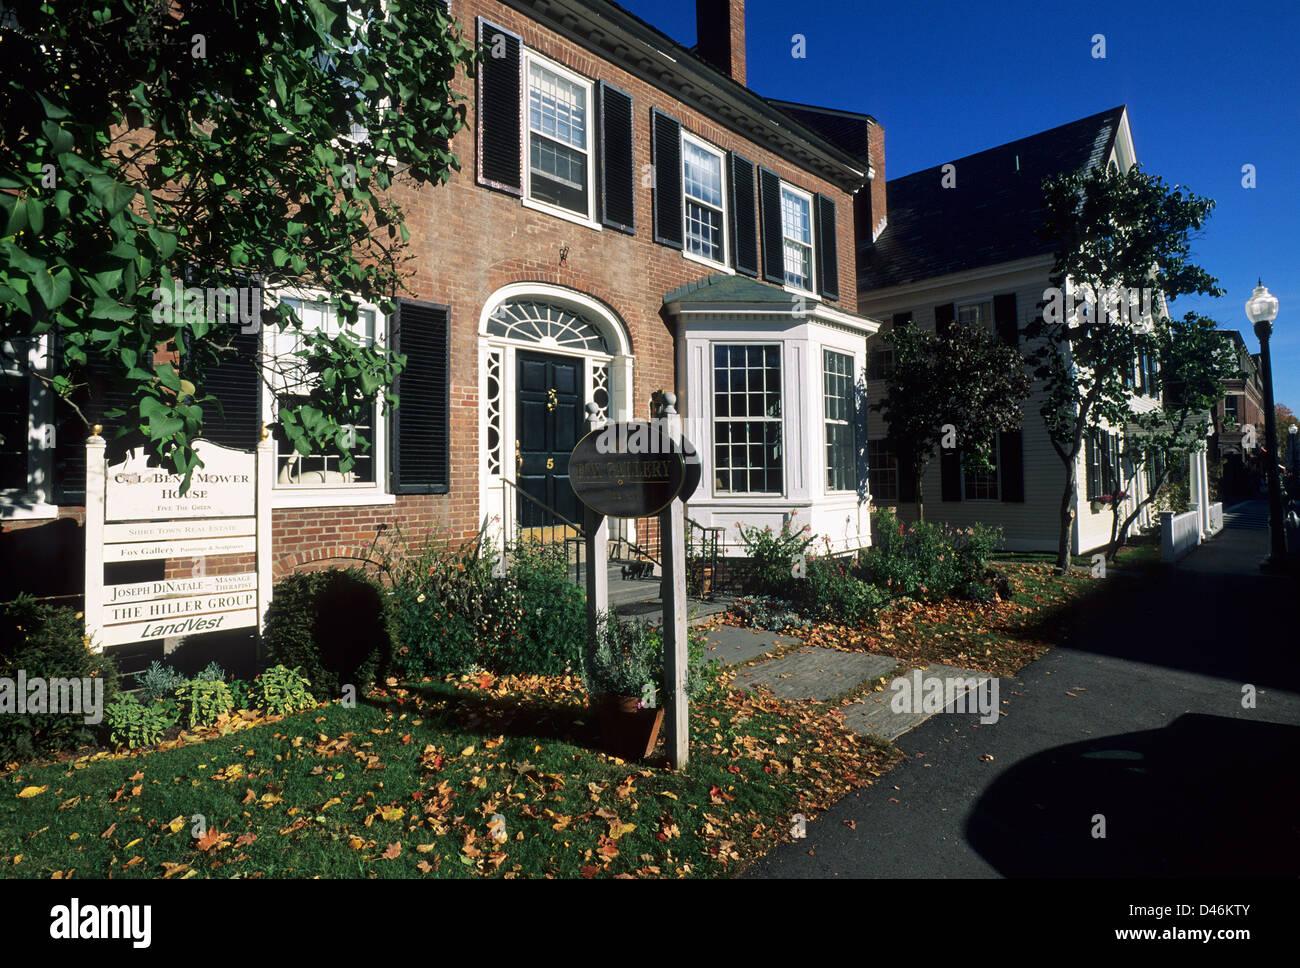 Elk280-1286 Vermont, Woodstock, historic houses - Stock Image